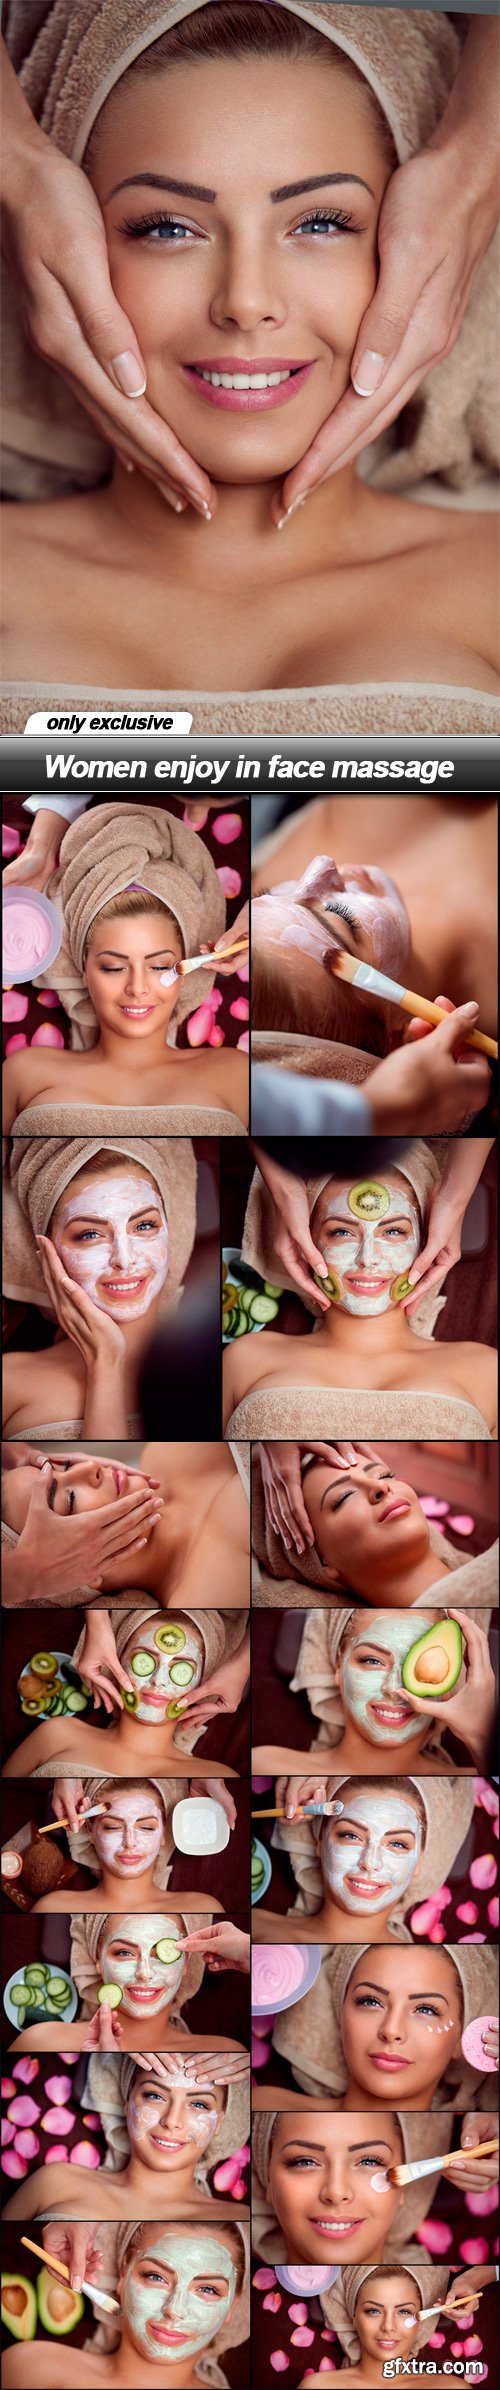 Women enjoy in face massage - 17 UHQ JPEG